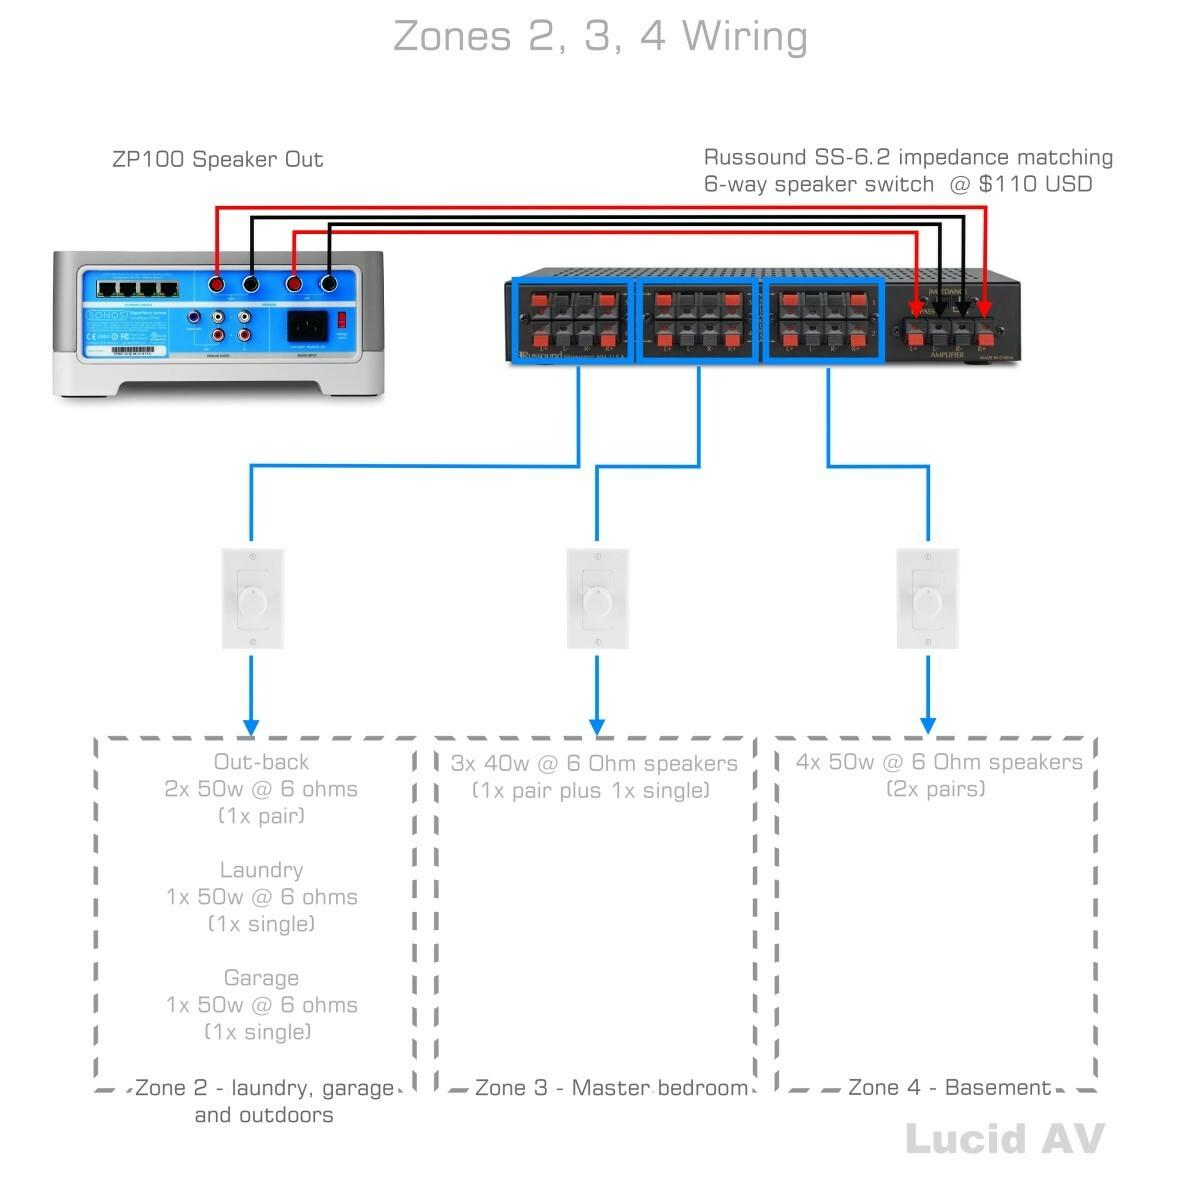 sonos wiring diagram wiring diagram content Fire Alarm Wiring Diagram